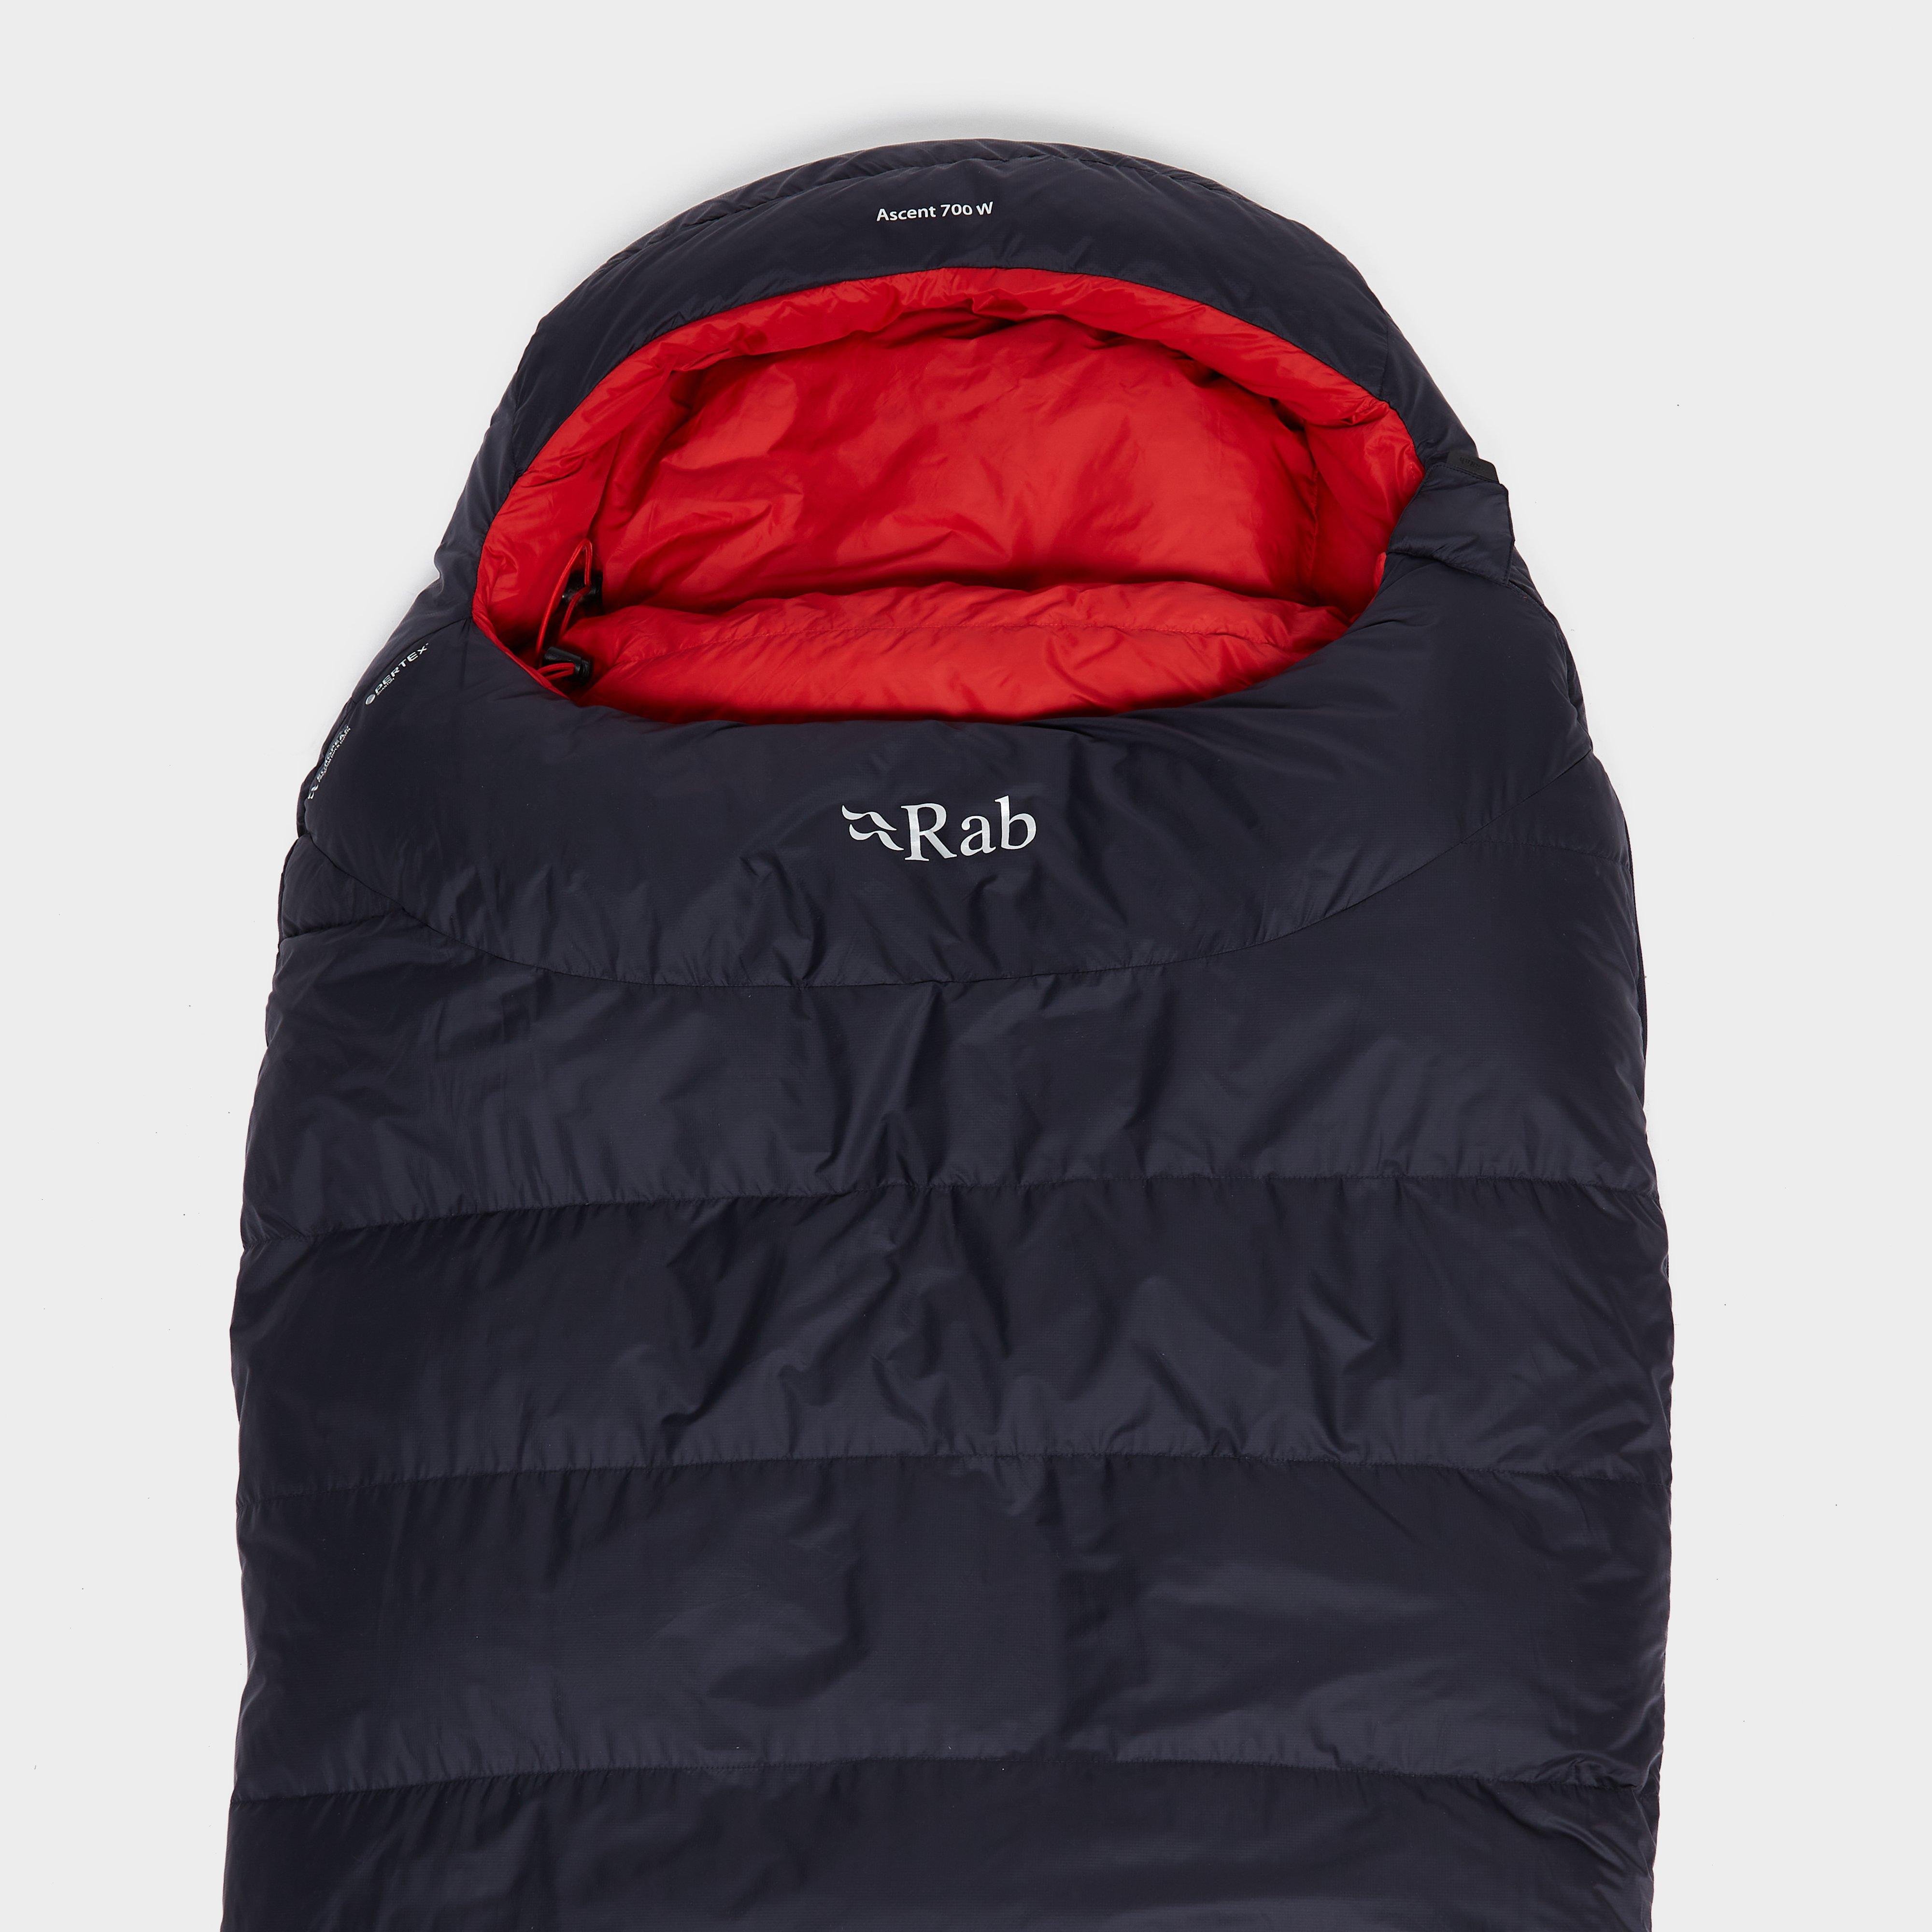 Rab Ascent 700 Sleeping Bag